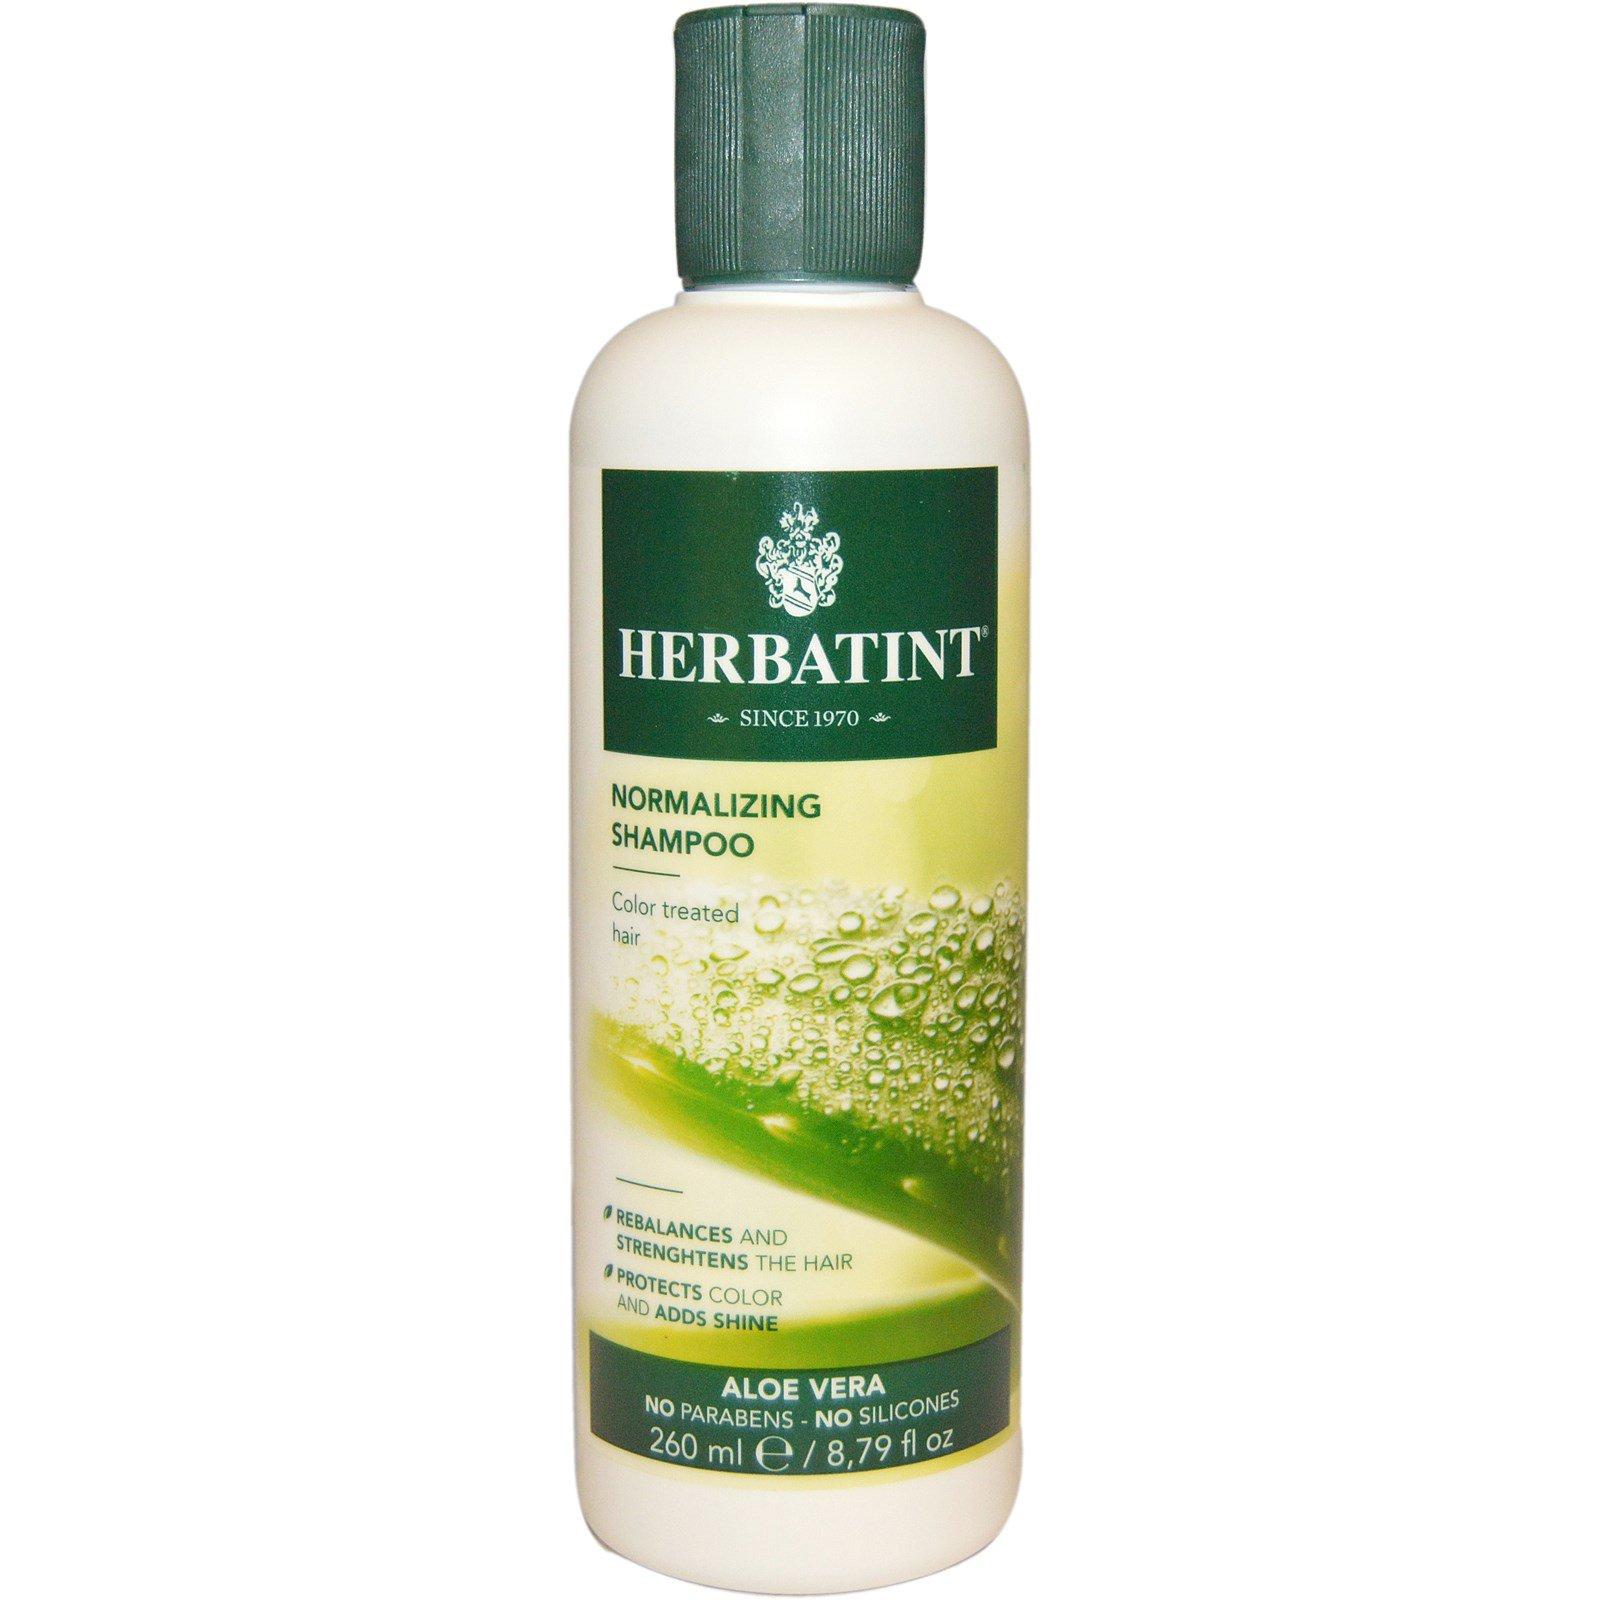 Herbatint, Normalizing Shampoo, 8.79 fl oz (260 ml)